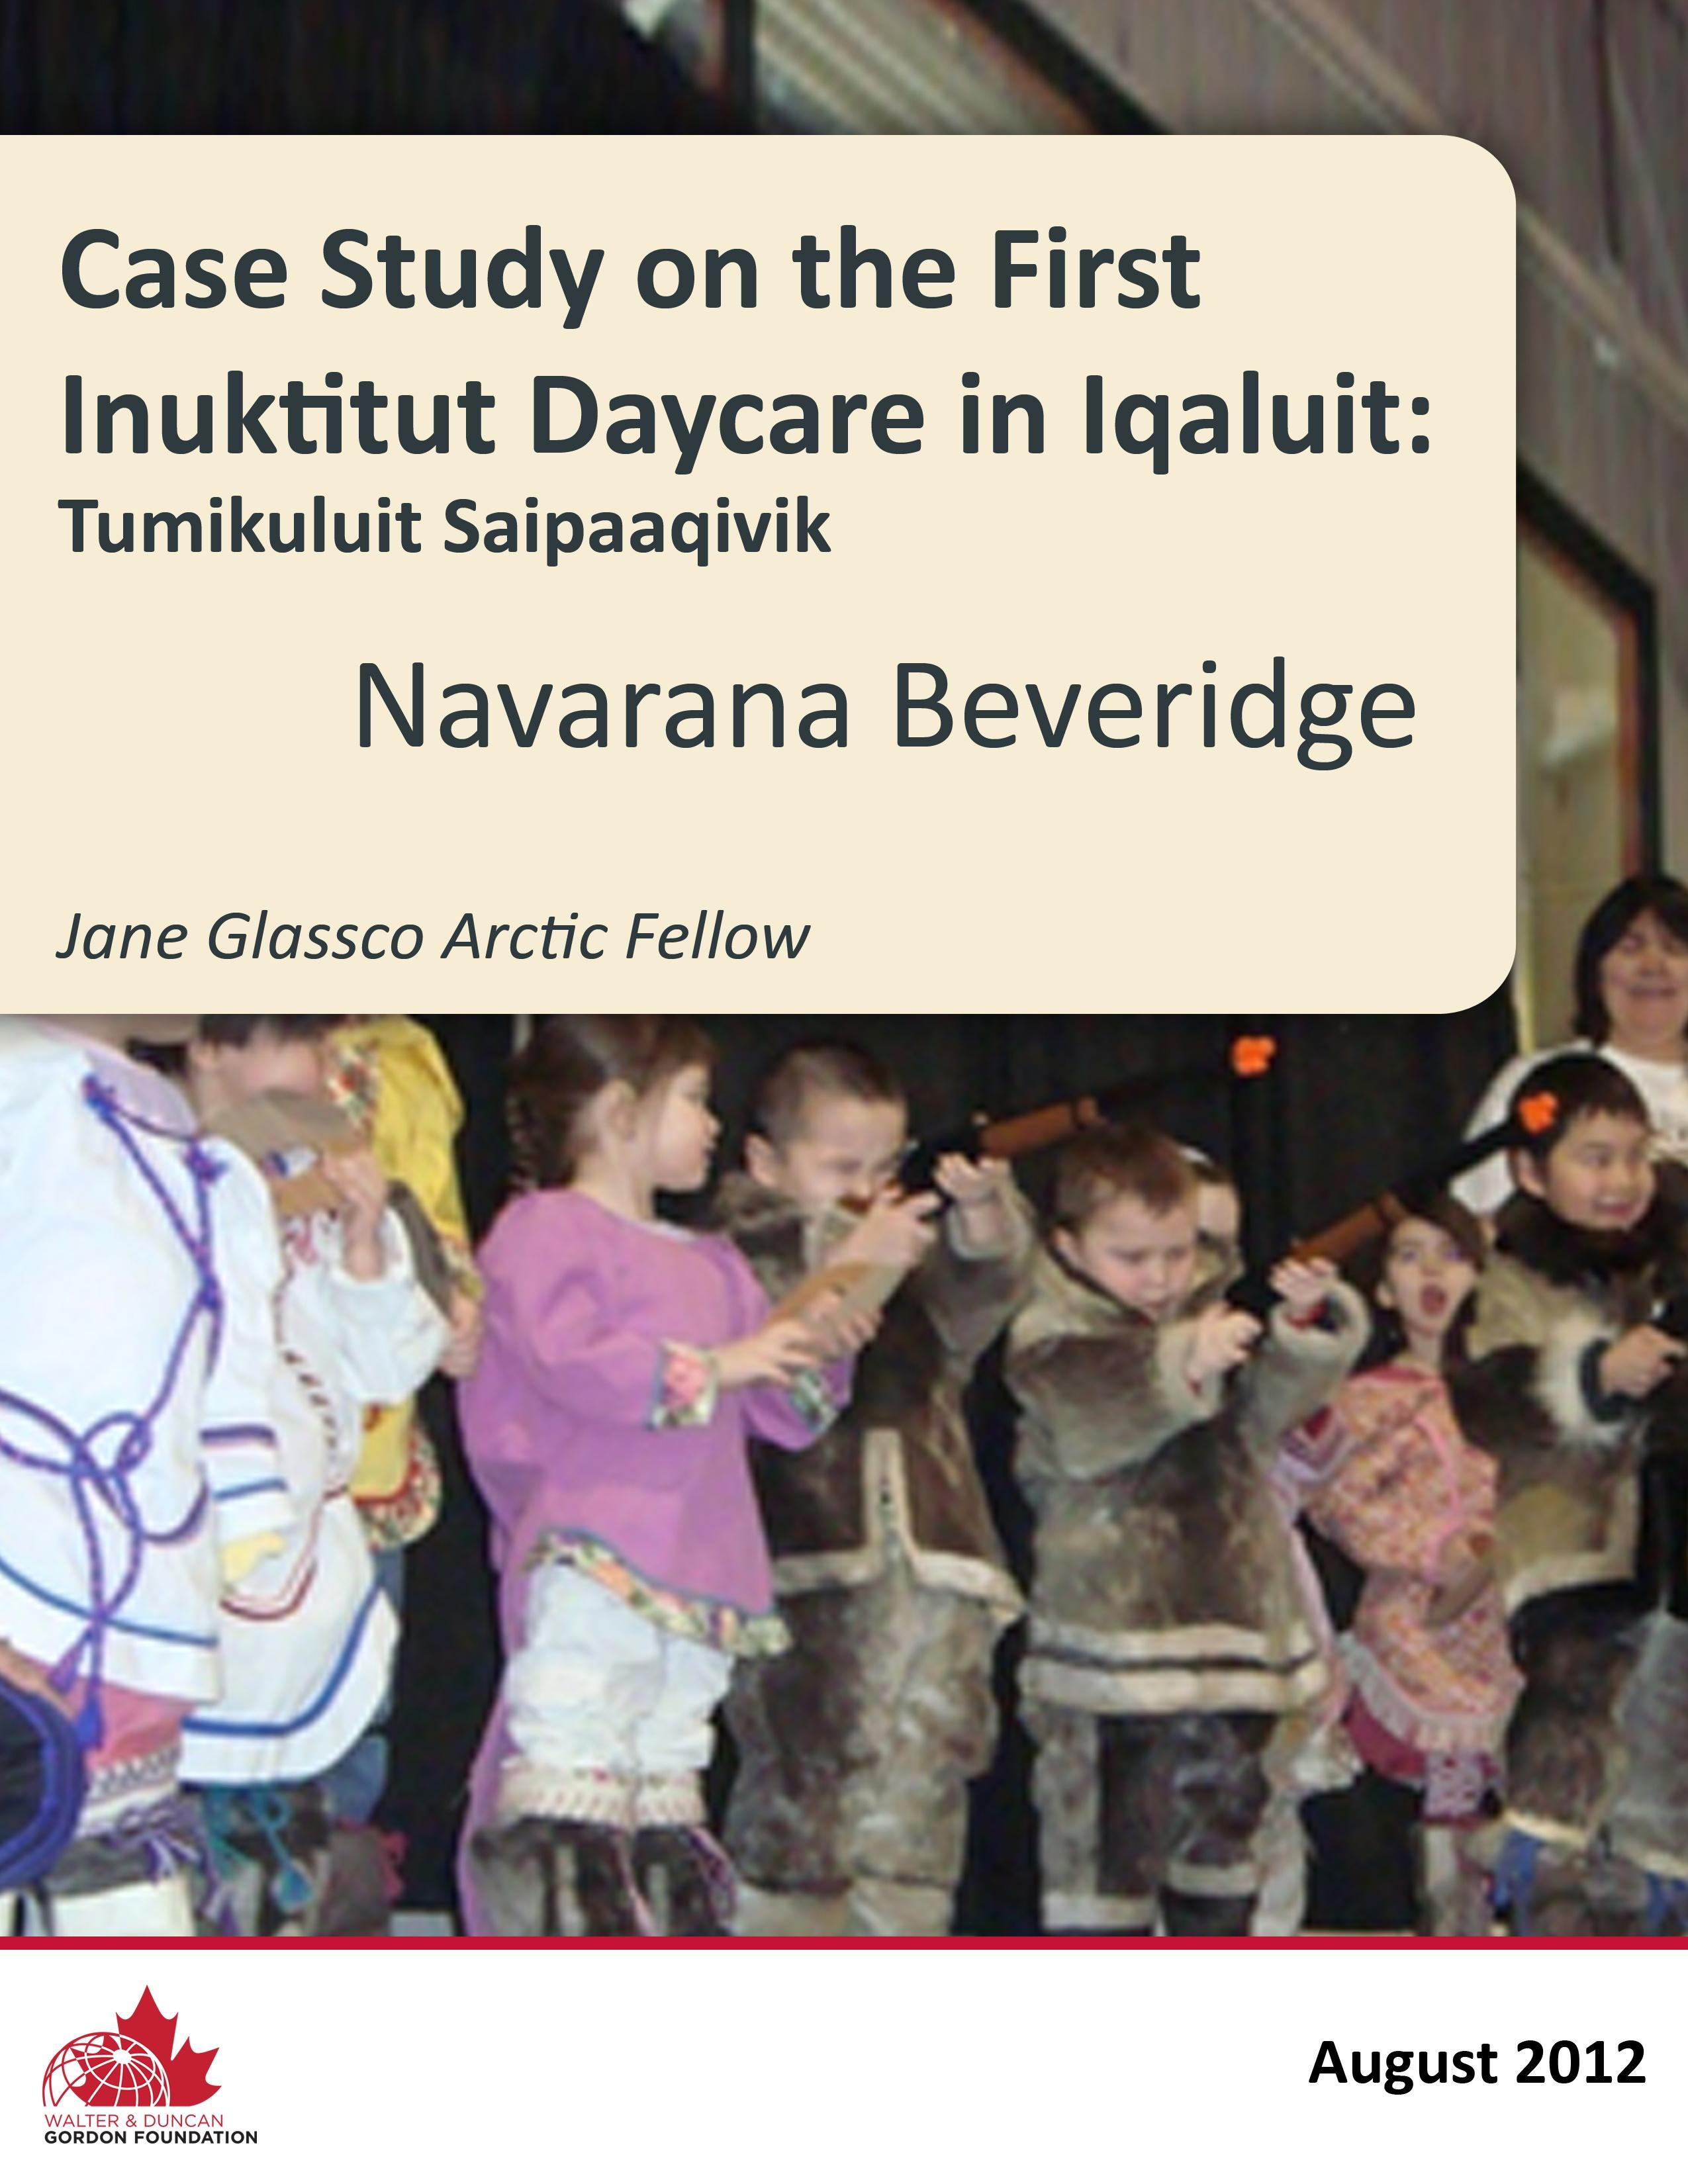 JGNF_2012_Navarana_FirstInuktitutDaycare_COVERONLY